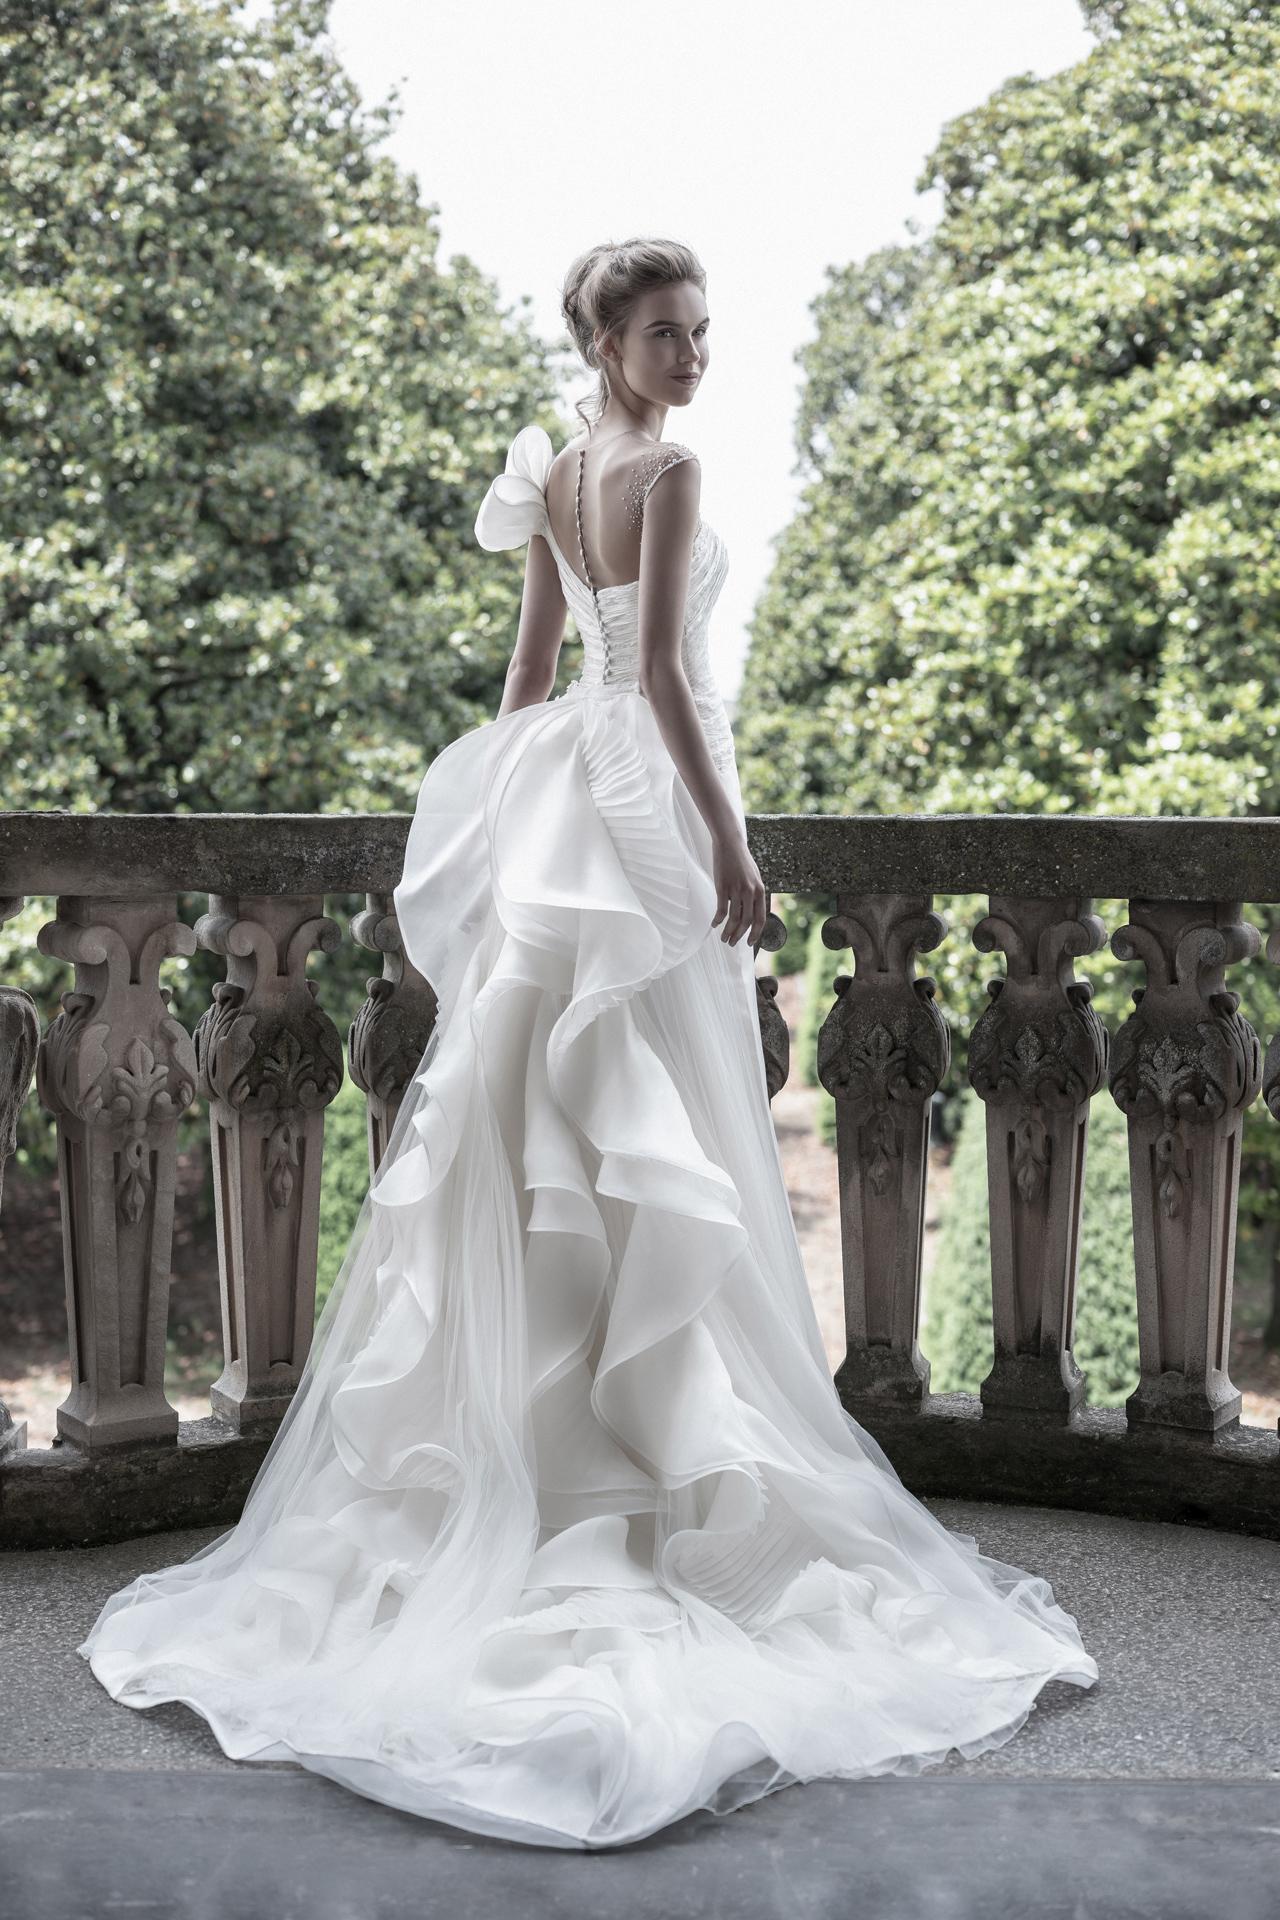 sporco a buon mercato design unico stili freschi Bridal Collection 2019 – Enzo Miccio Bridal Collection